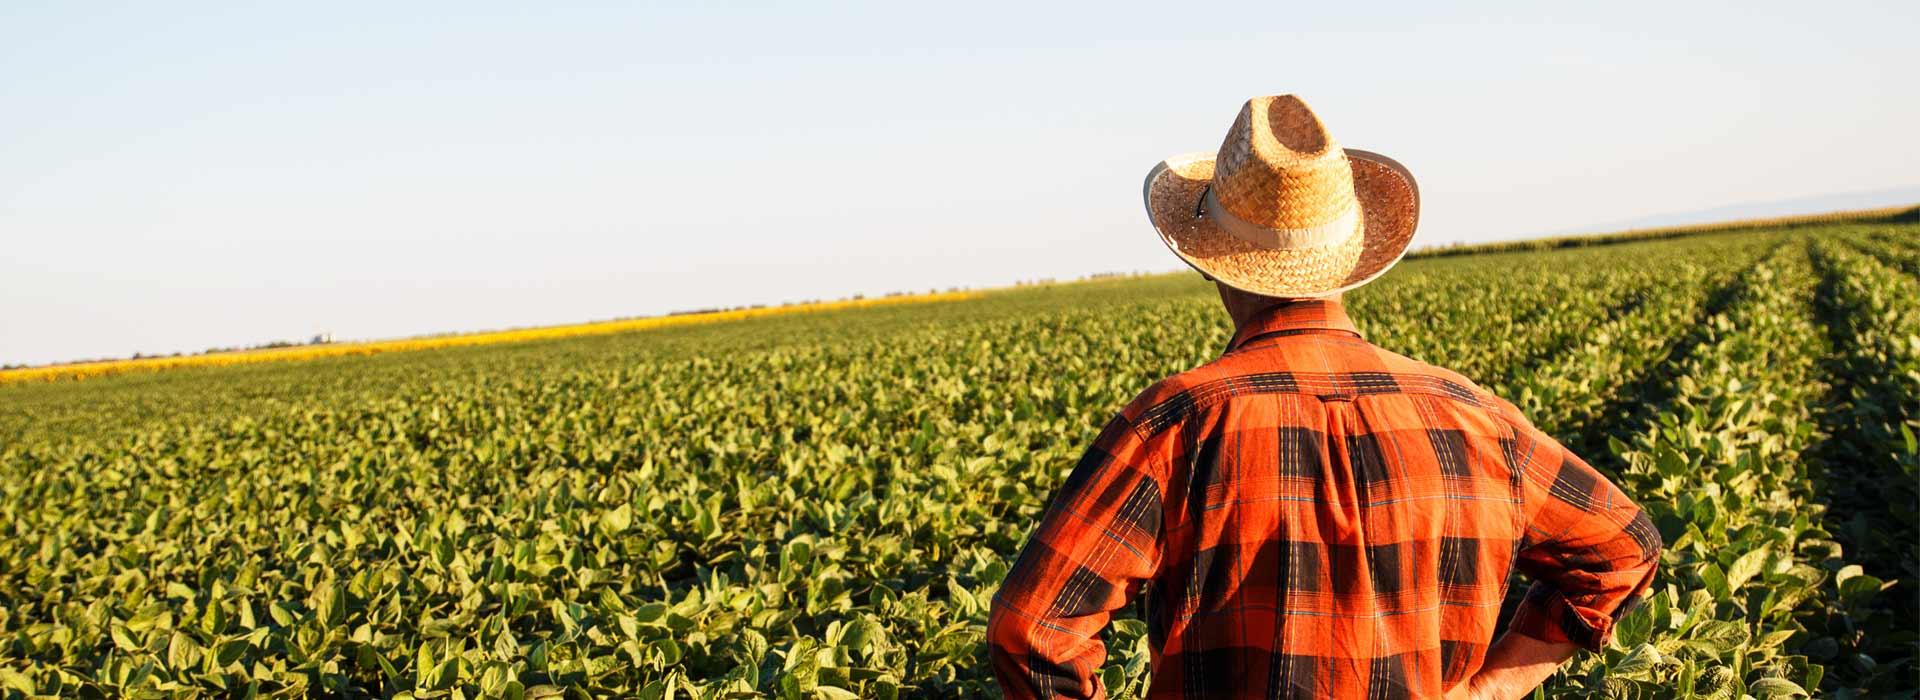 banner-farmer-field